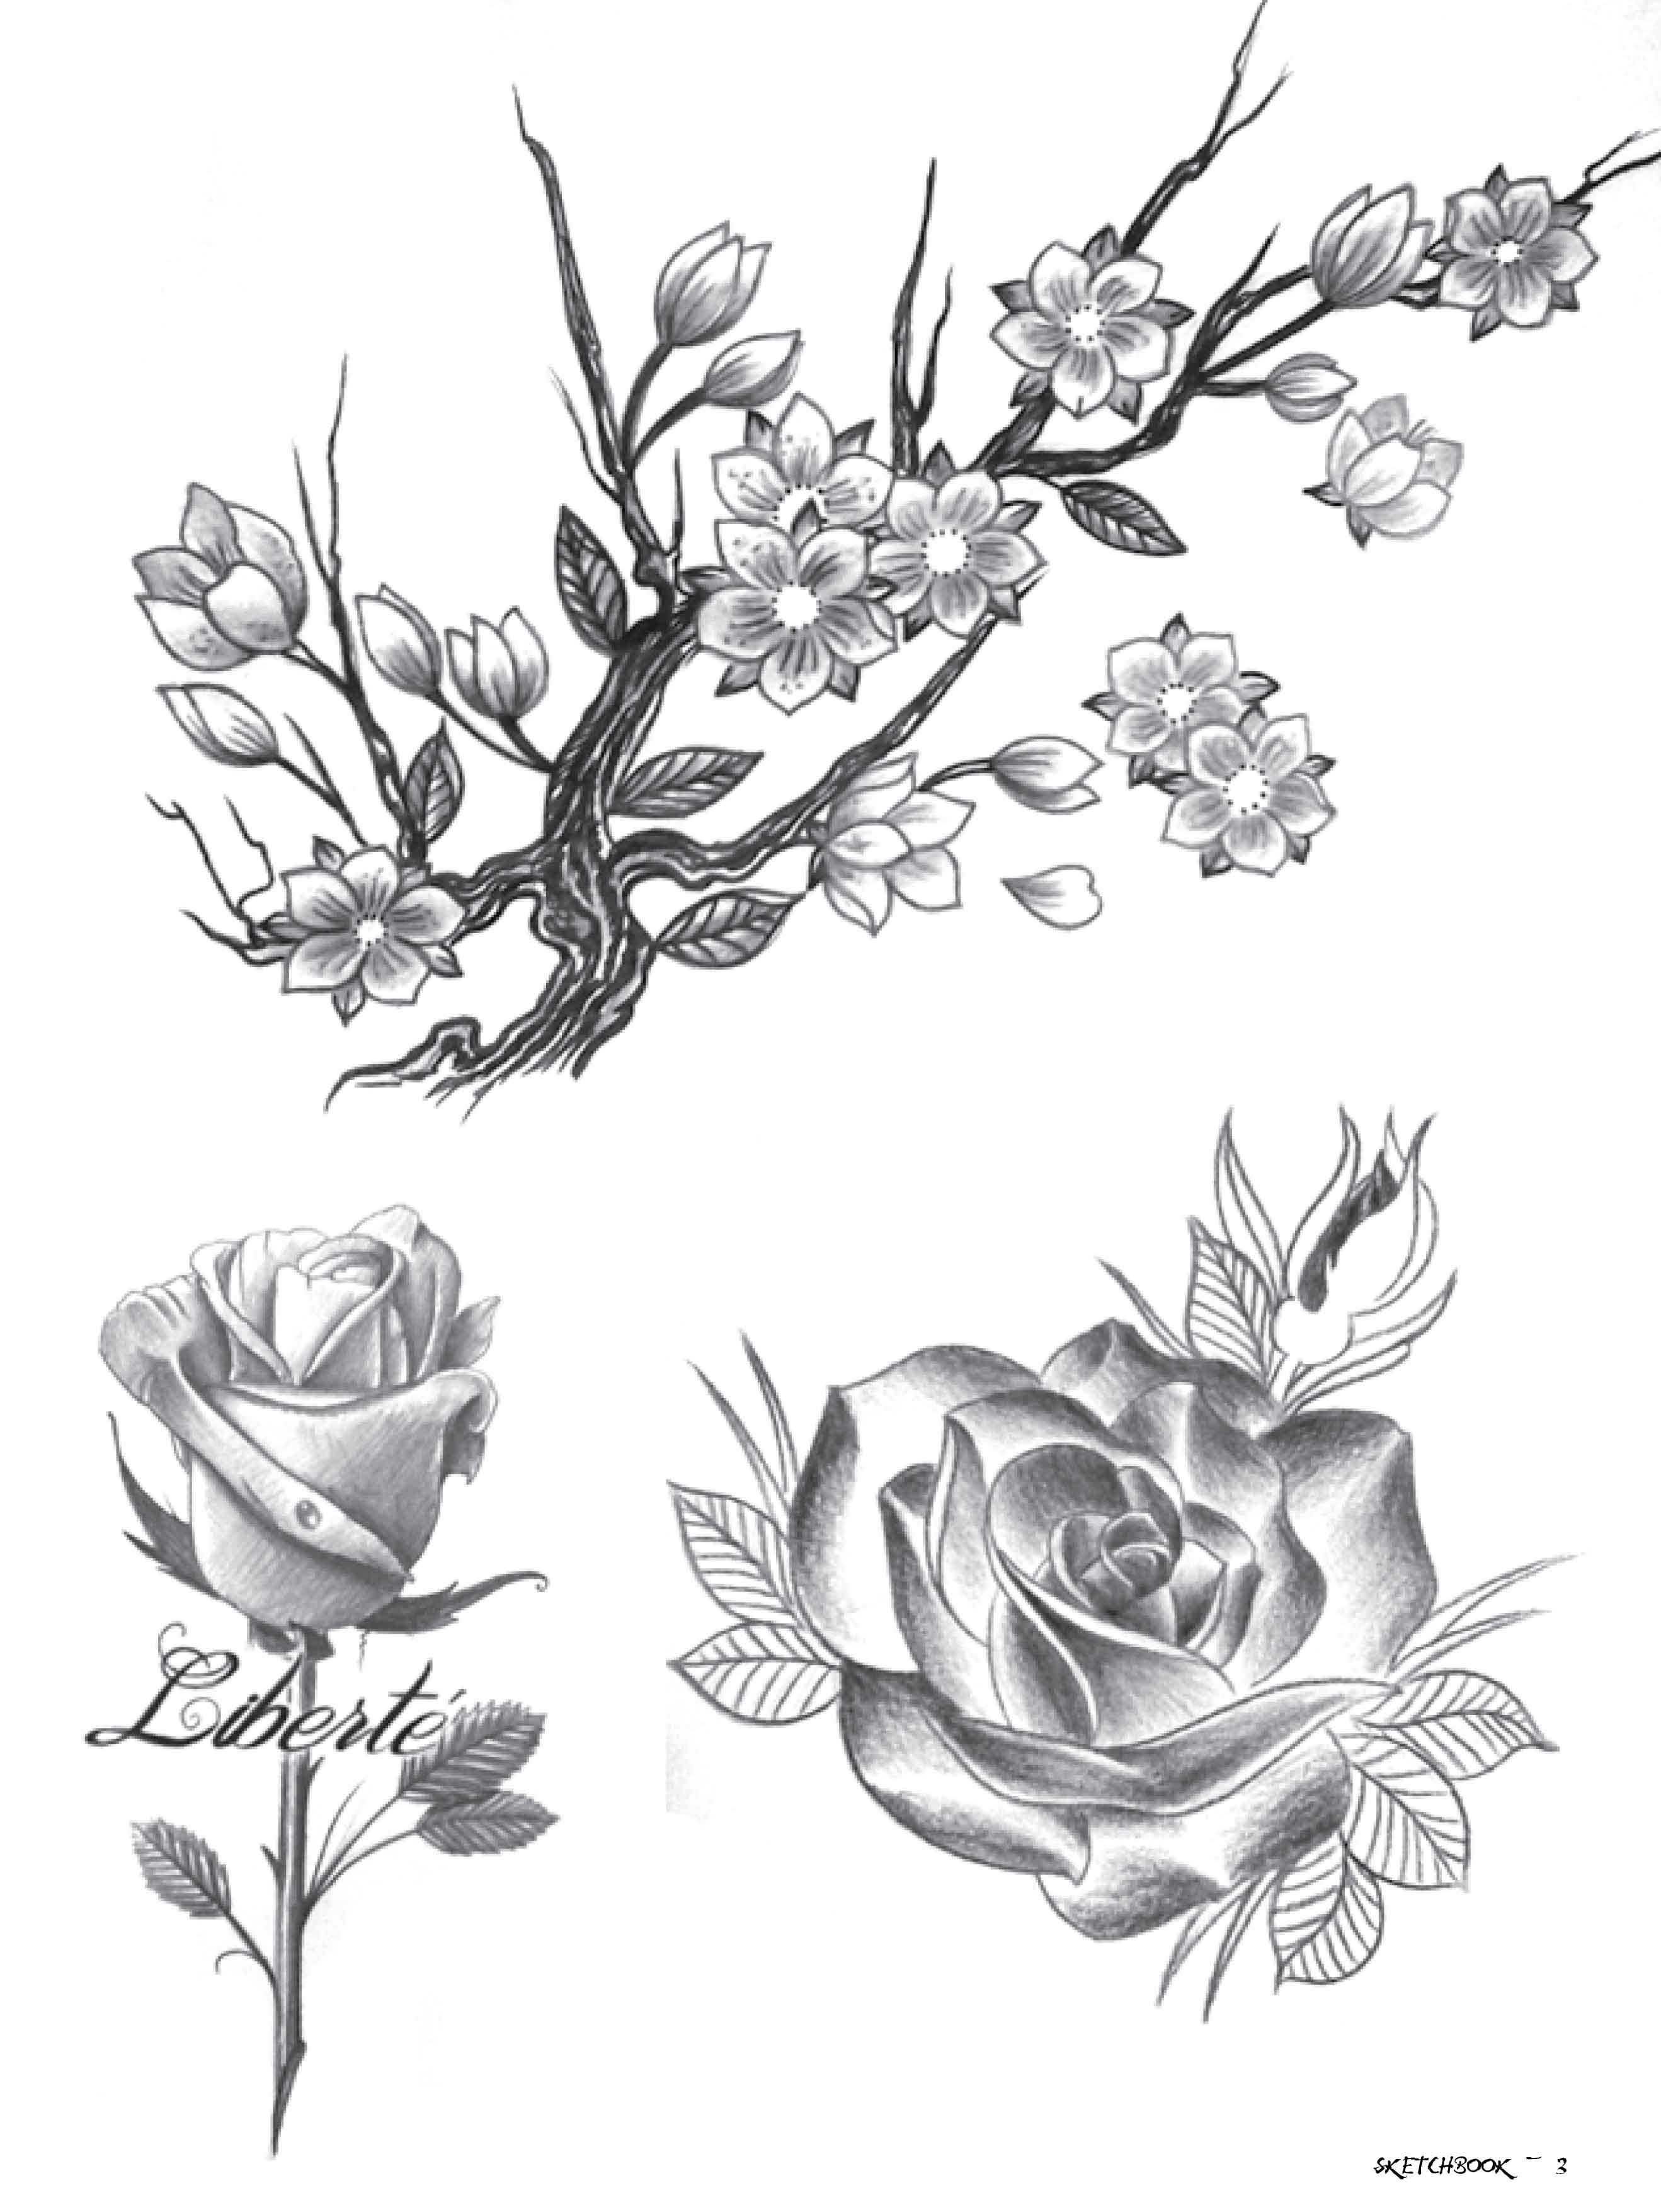 Tcm supply relgio pinterest tattoo tatoo and tattos lotus flowers pencil drawings tattoo designs tcm supply izmirmasajfo